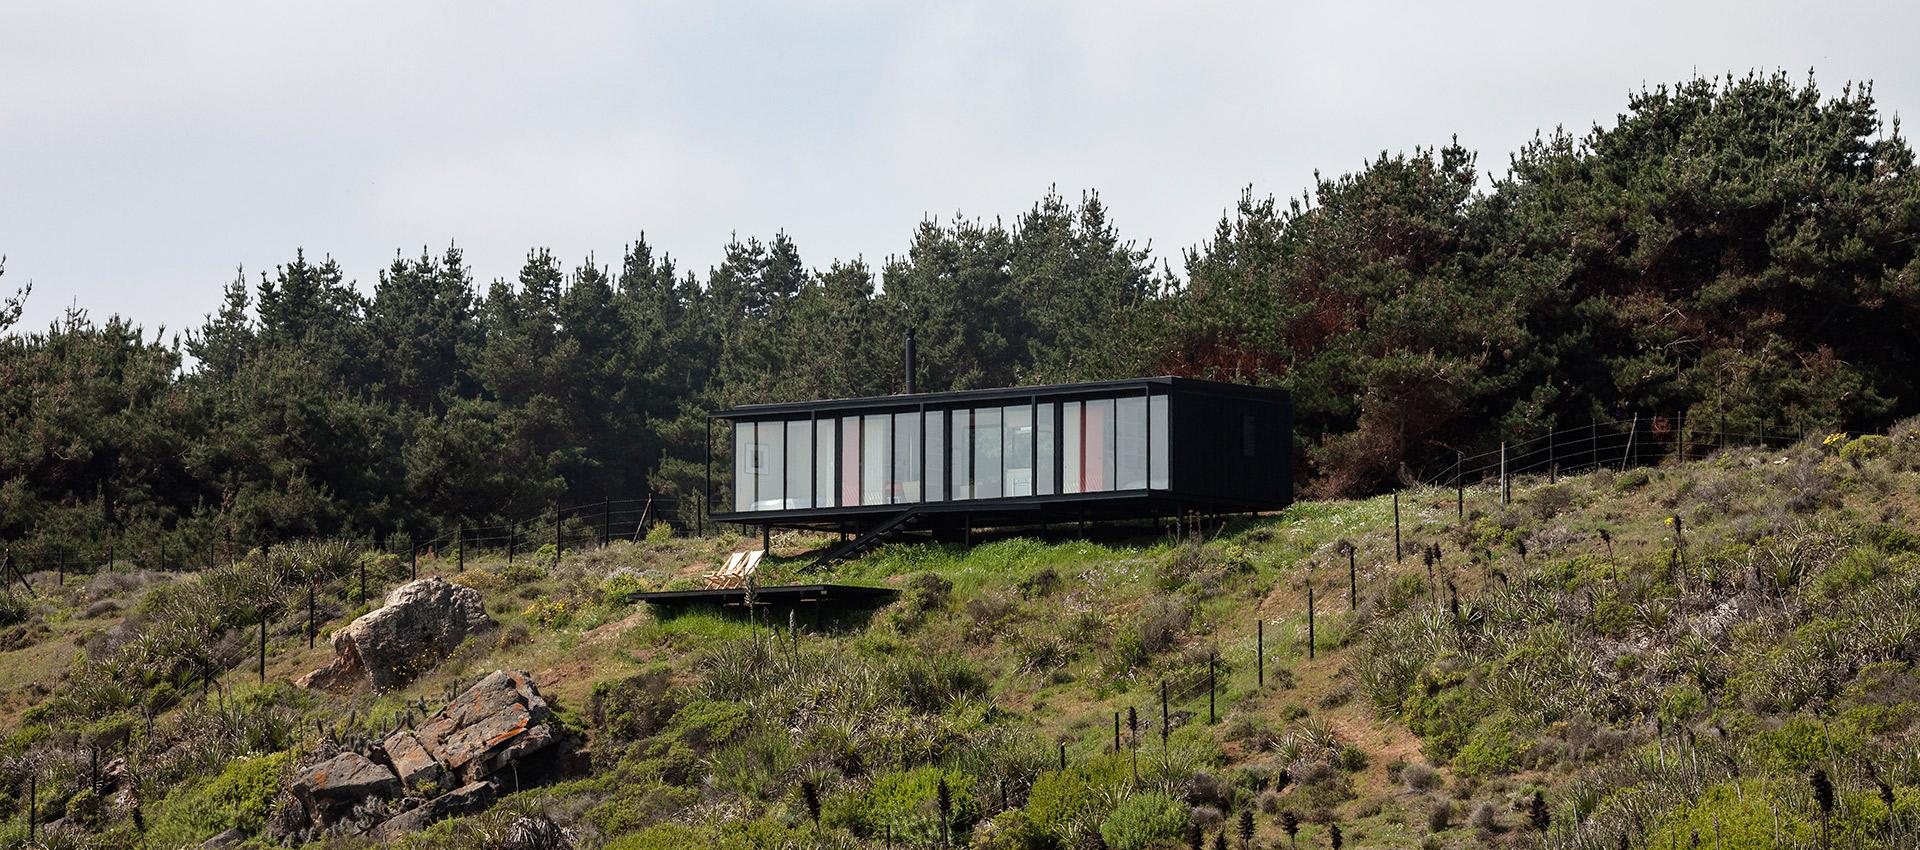 Casa Remota por Felipe Assadi Arquitectos. Fotografía © Fernando Alda